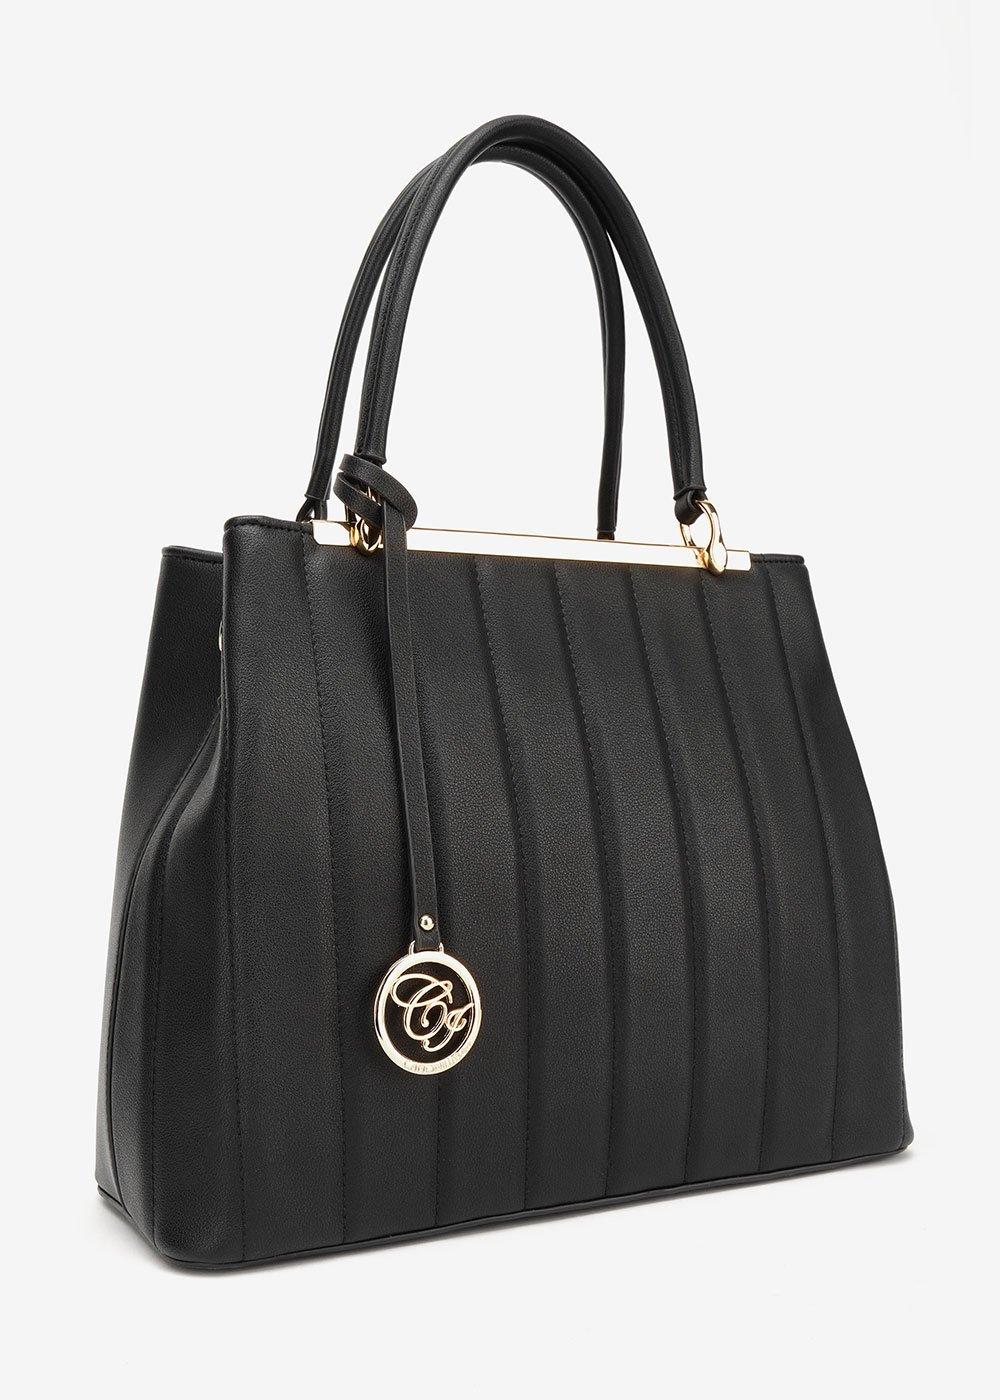 Bloody tote bag - Black - Woman